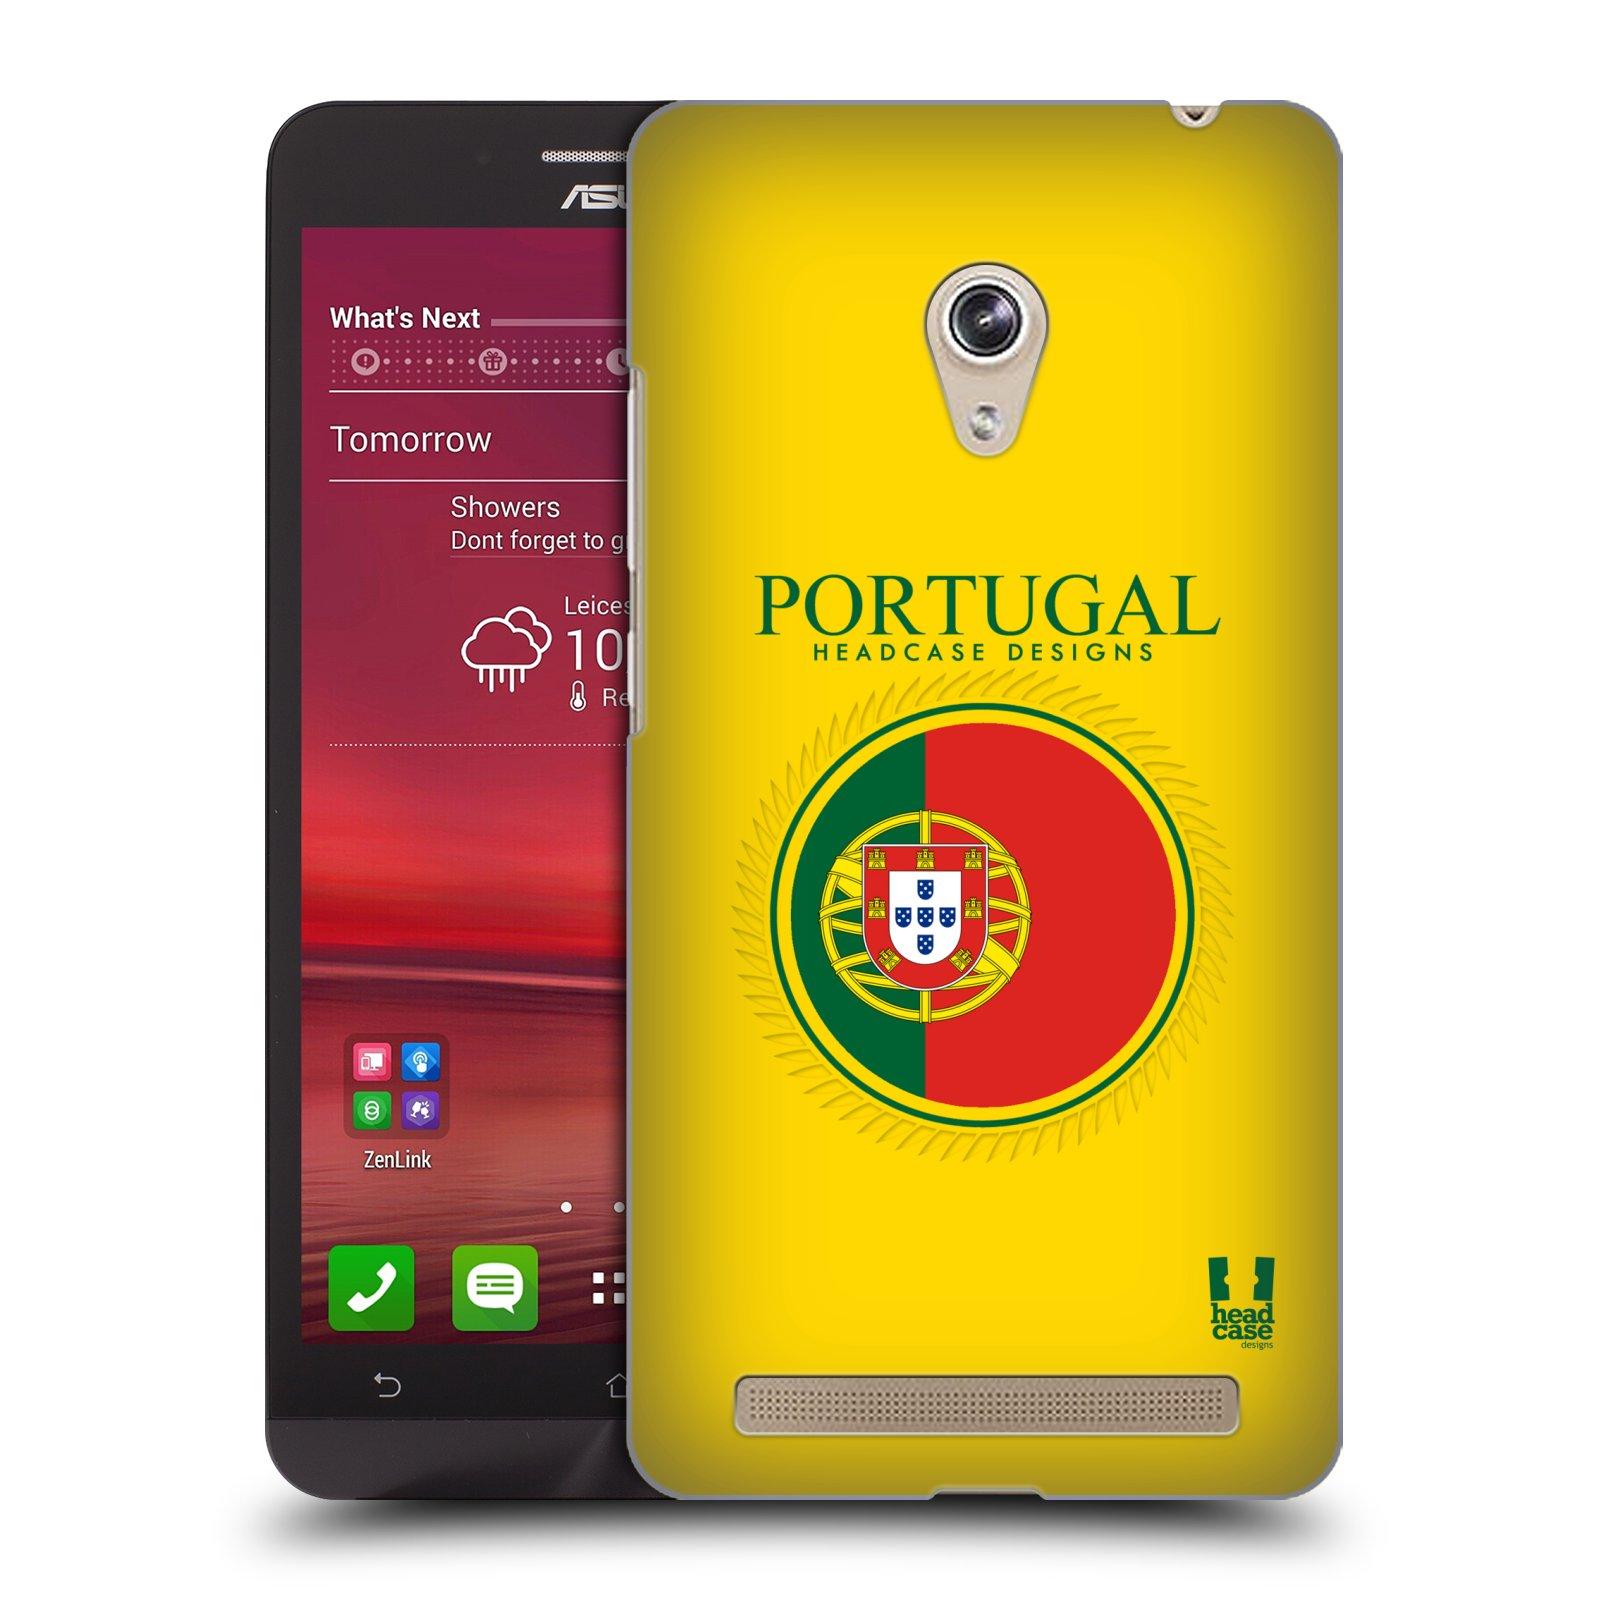 HEAD CASE plastový obal na mobil Asus Zenfone 6 vzor Vlajky státy 2 PORTUGALSKO